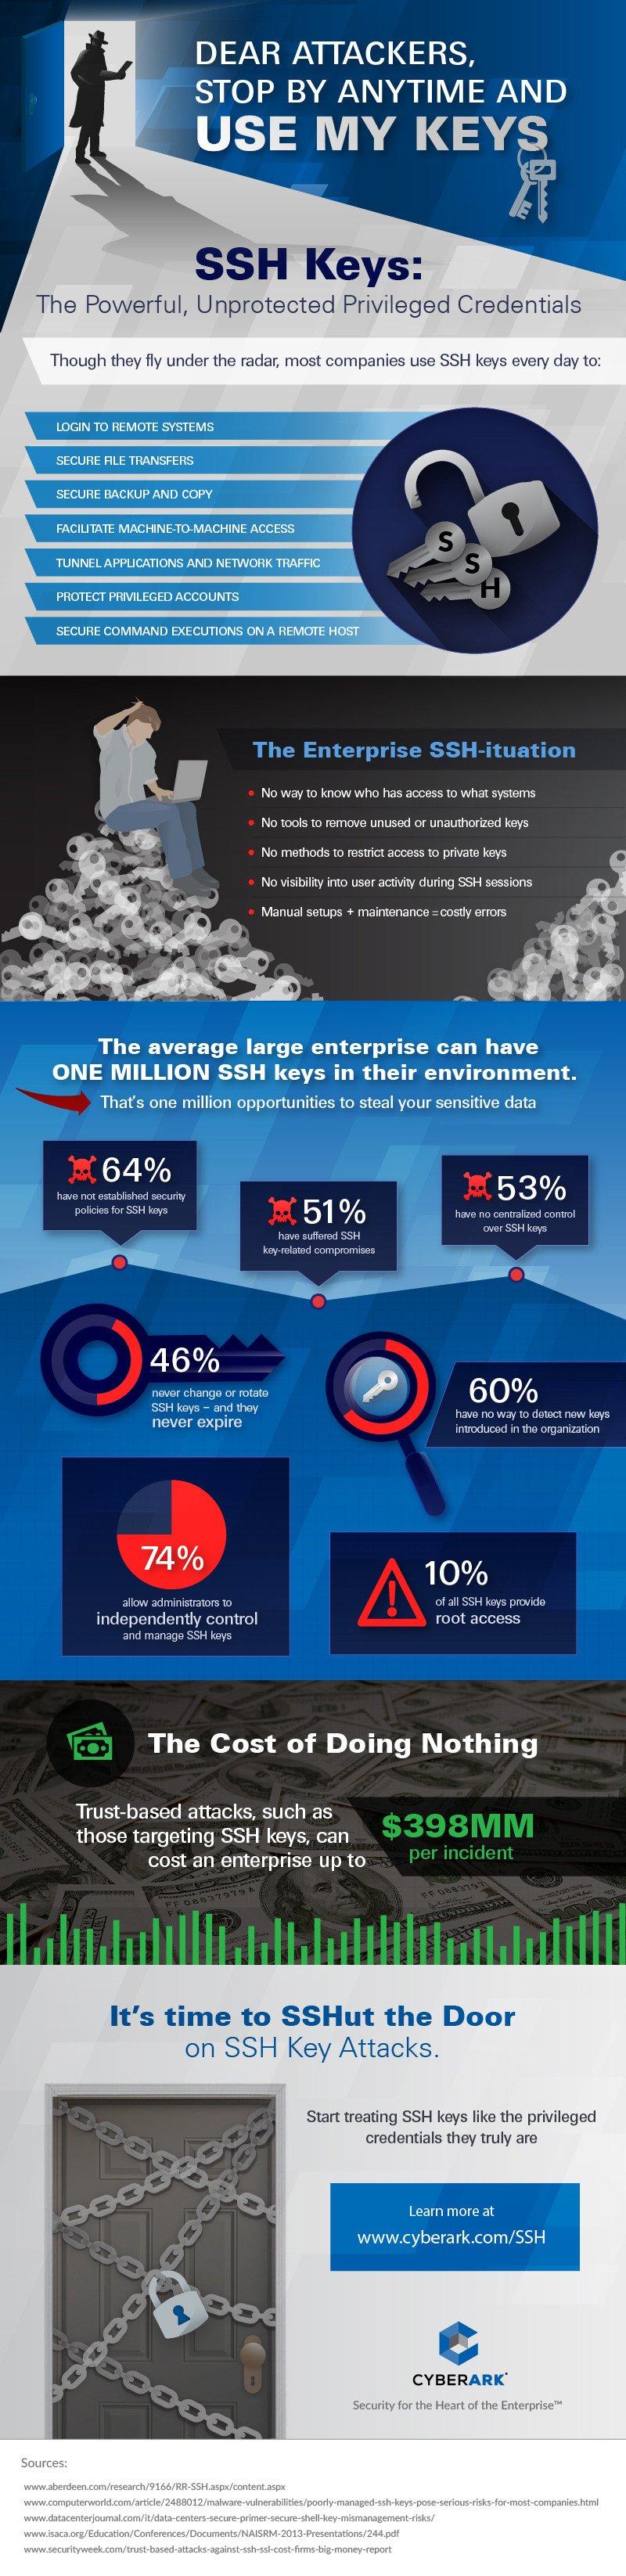 CyberArk-SSH-Keys-Infographic-1014